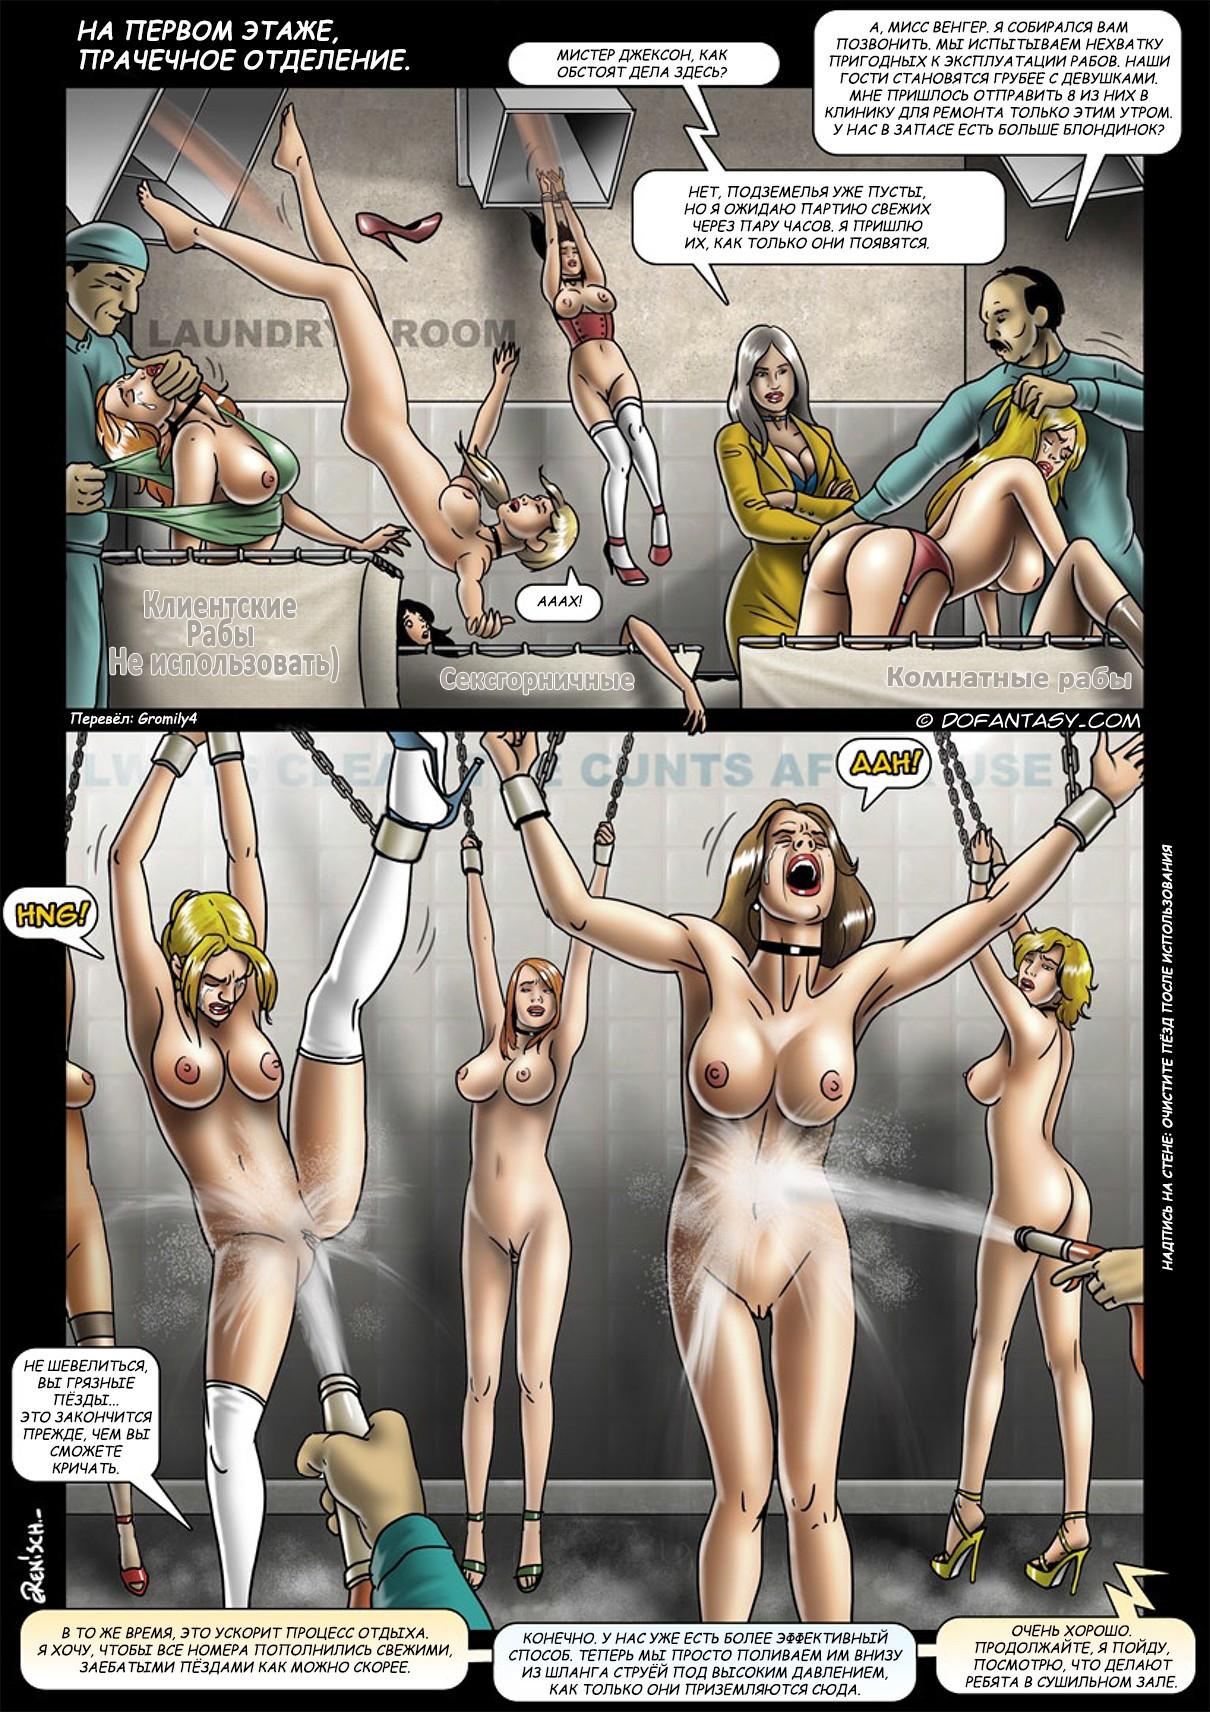 rabinya-chitat-porno